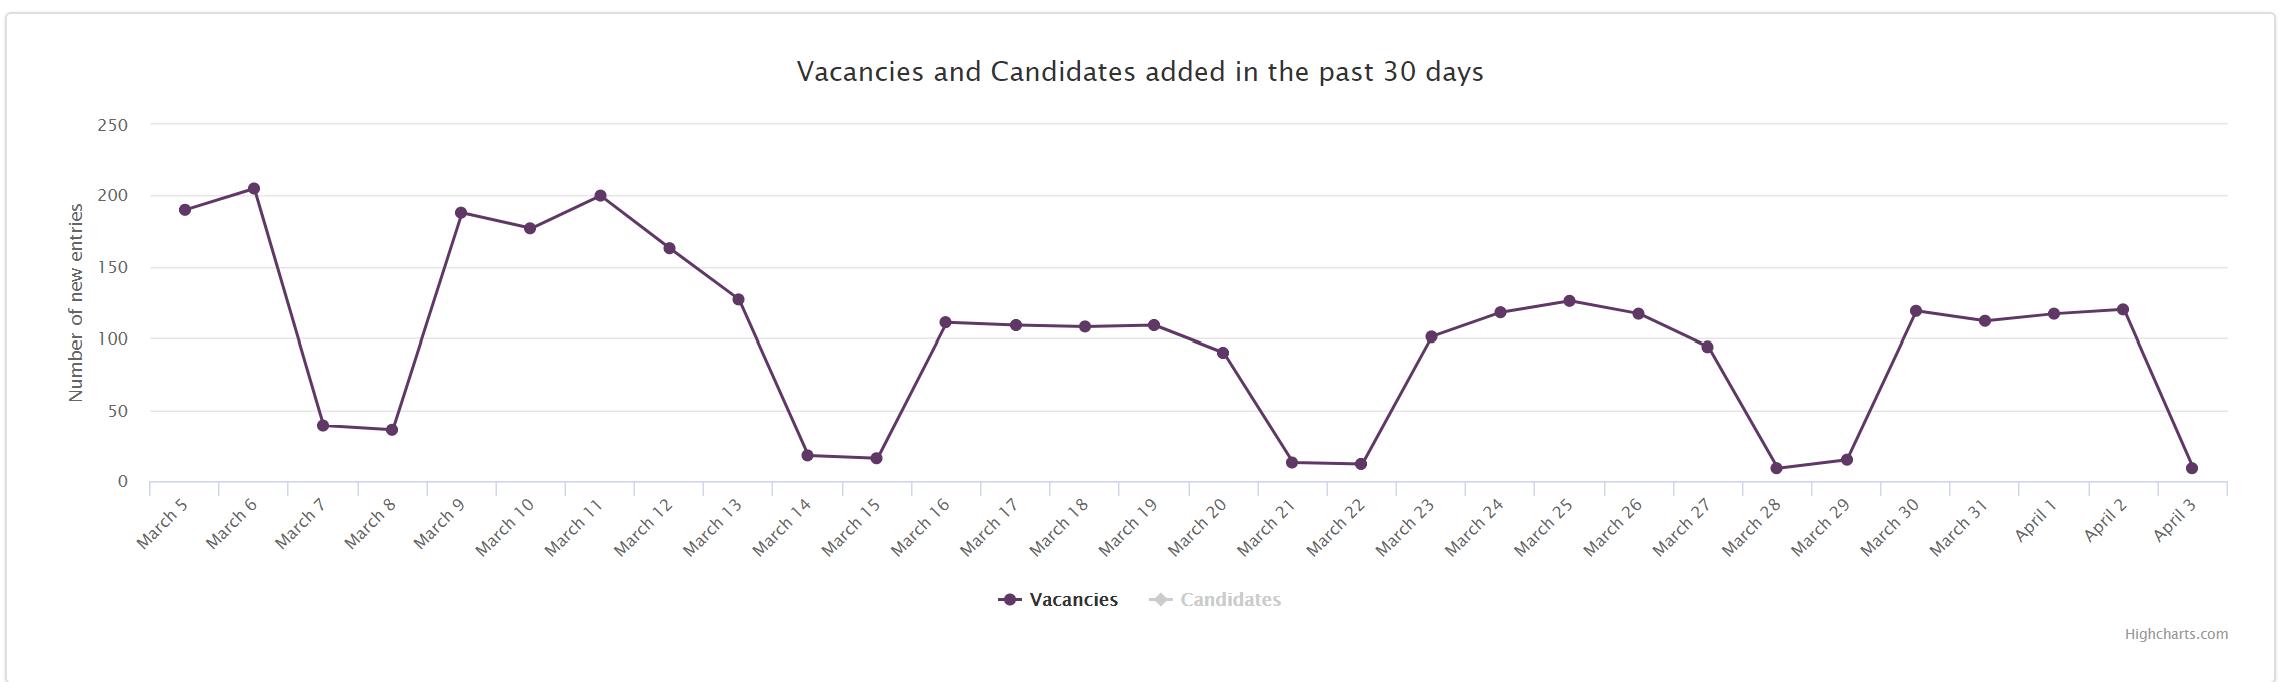 Trend vacancies Slovakia past 30 days